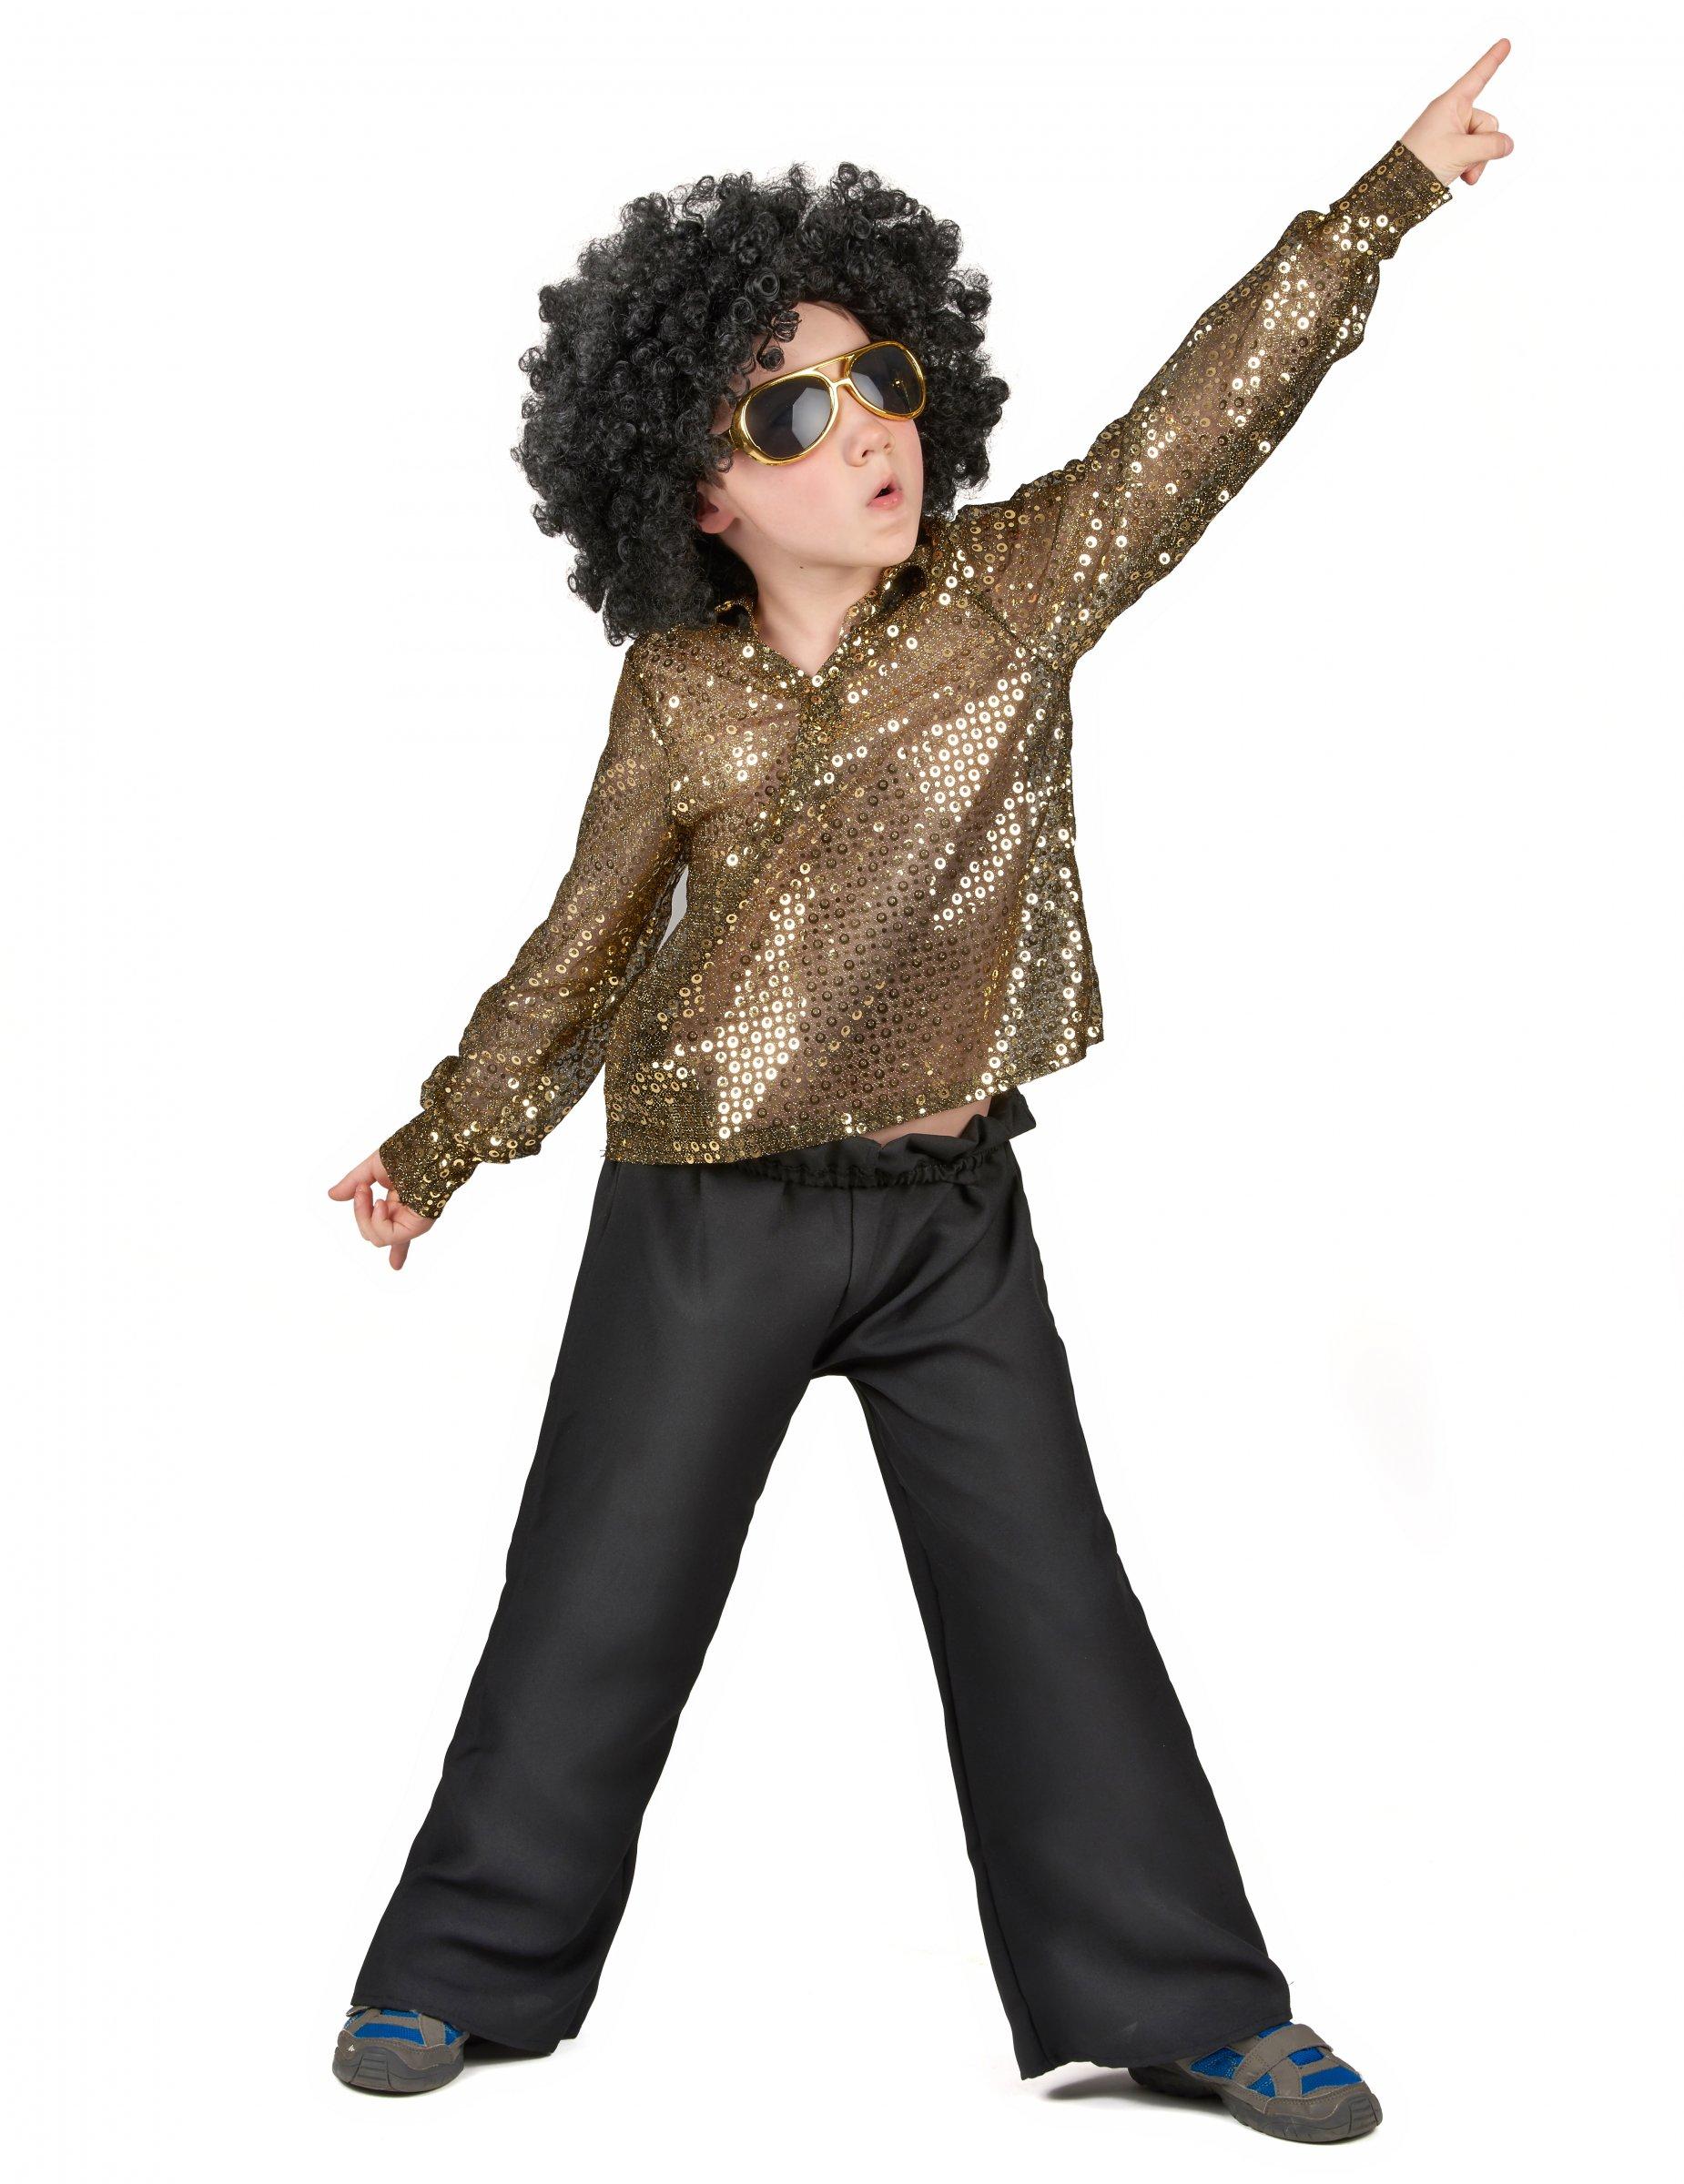 disco outfit pailletten kinderkost m gold schwarz. Black Bedroom Furniture Sets. Home Design Ideas